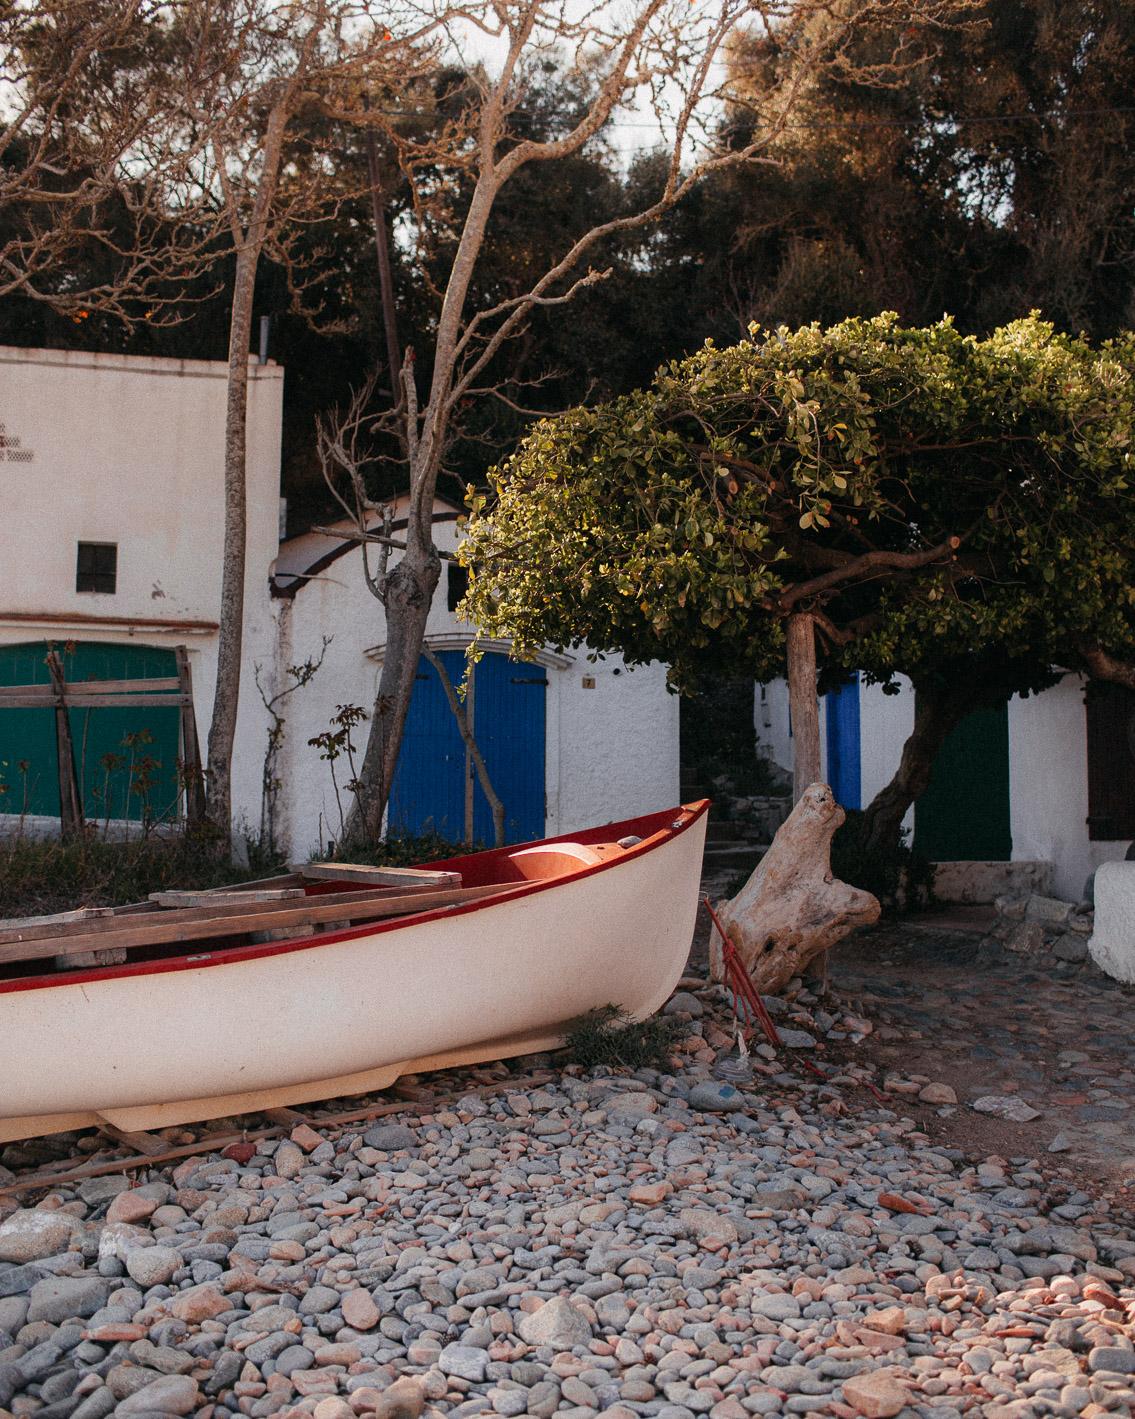 Costa Brava Cala S'Alguer - The cat, you and us